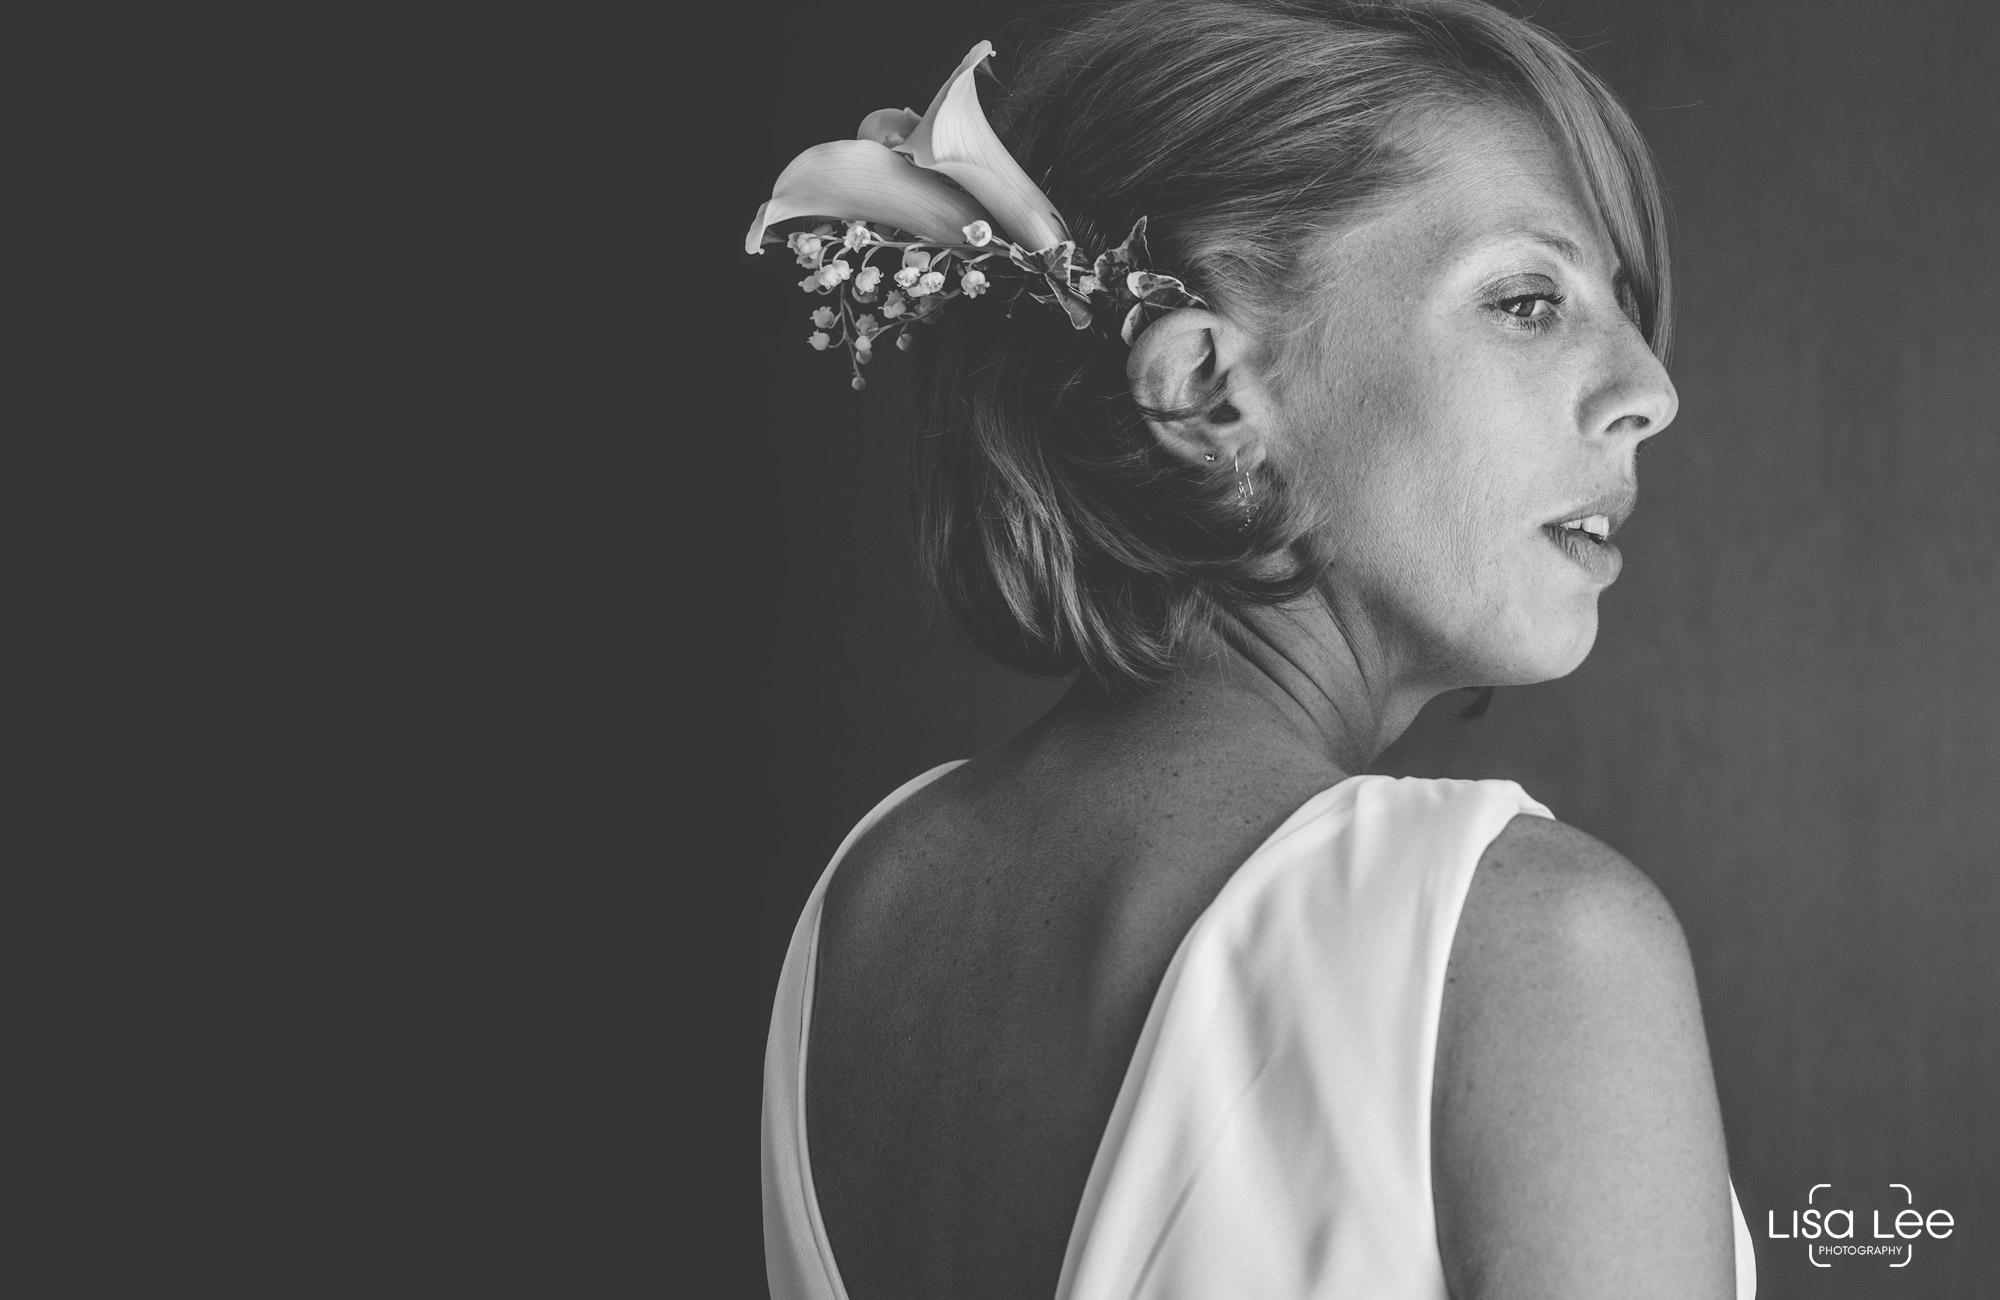 lisa-lee-wedding-photography-christchurch-dorset-bride2.jpg